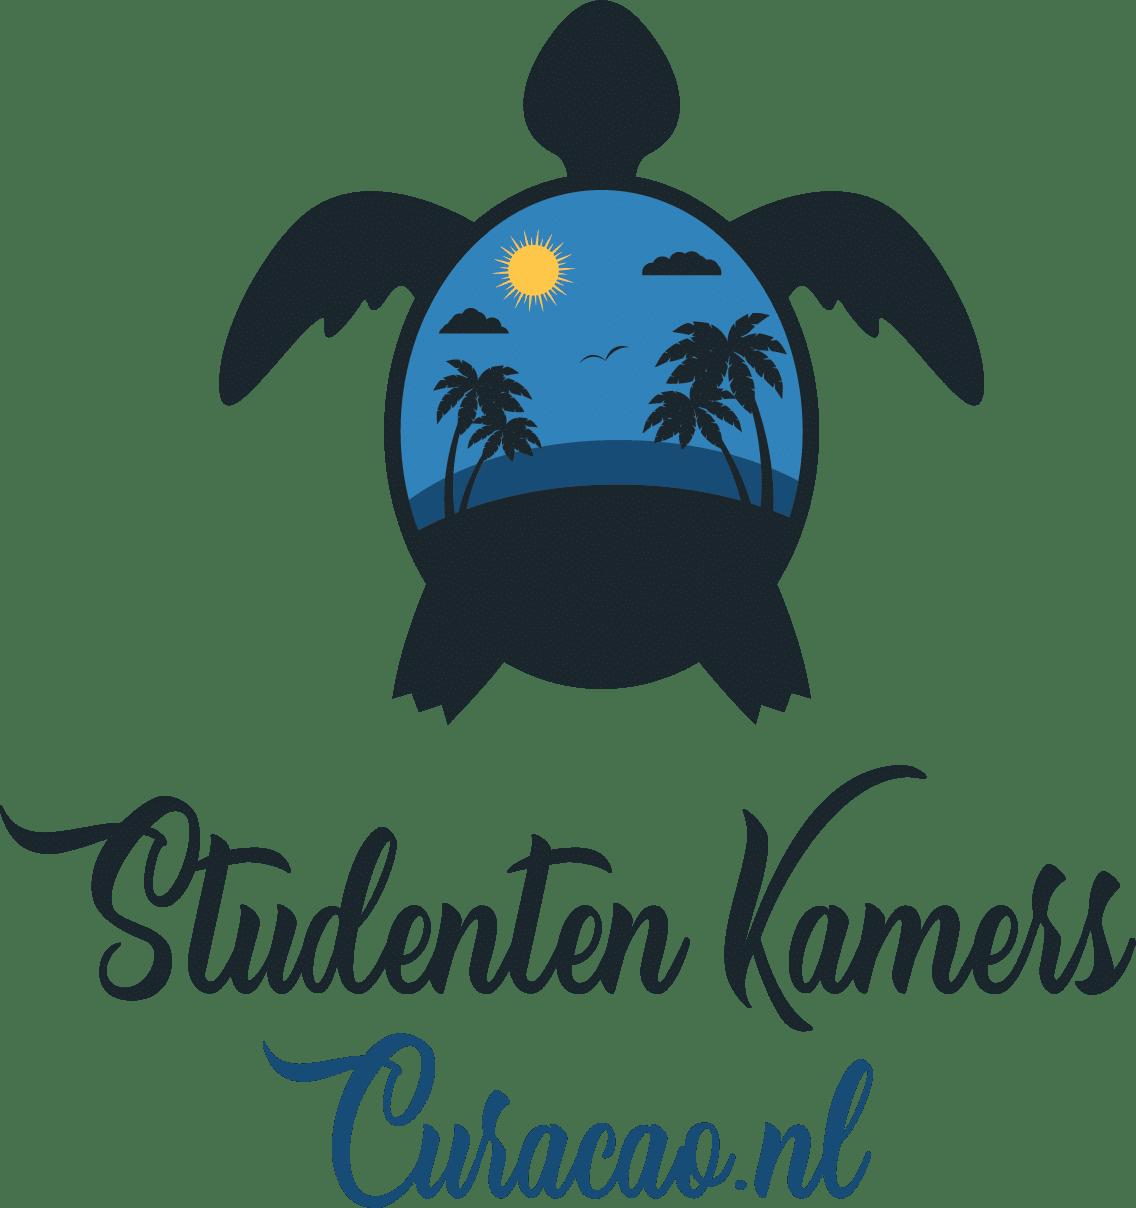 Studentenkamers Curacao